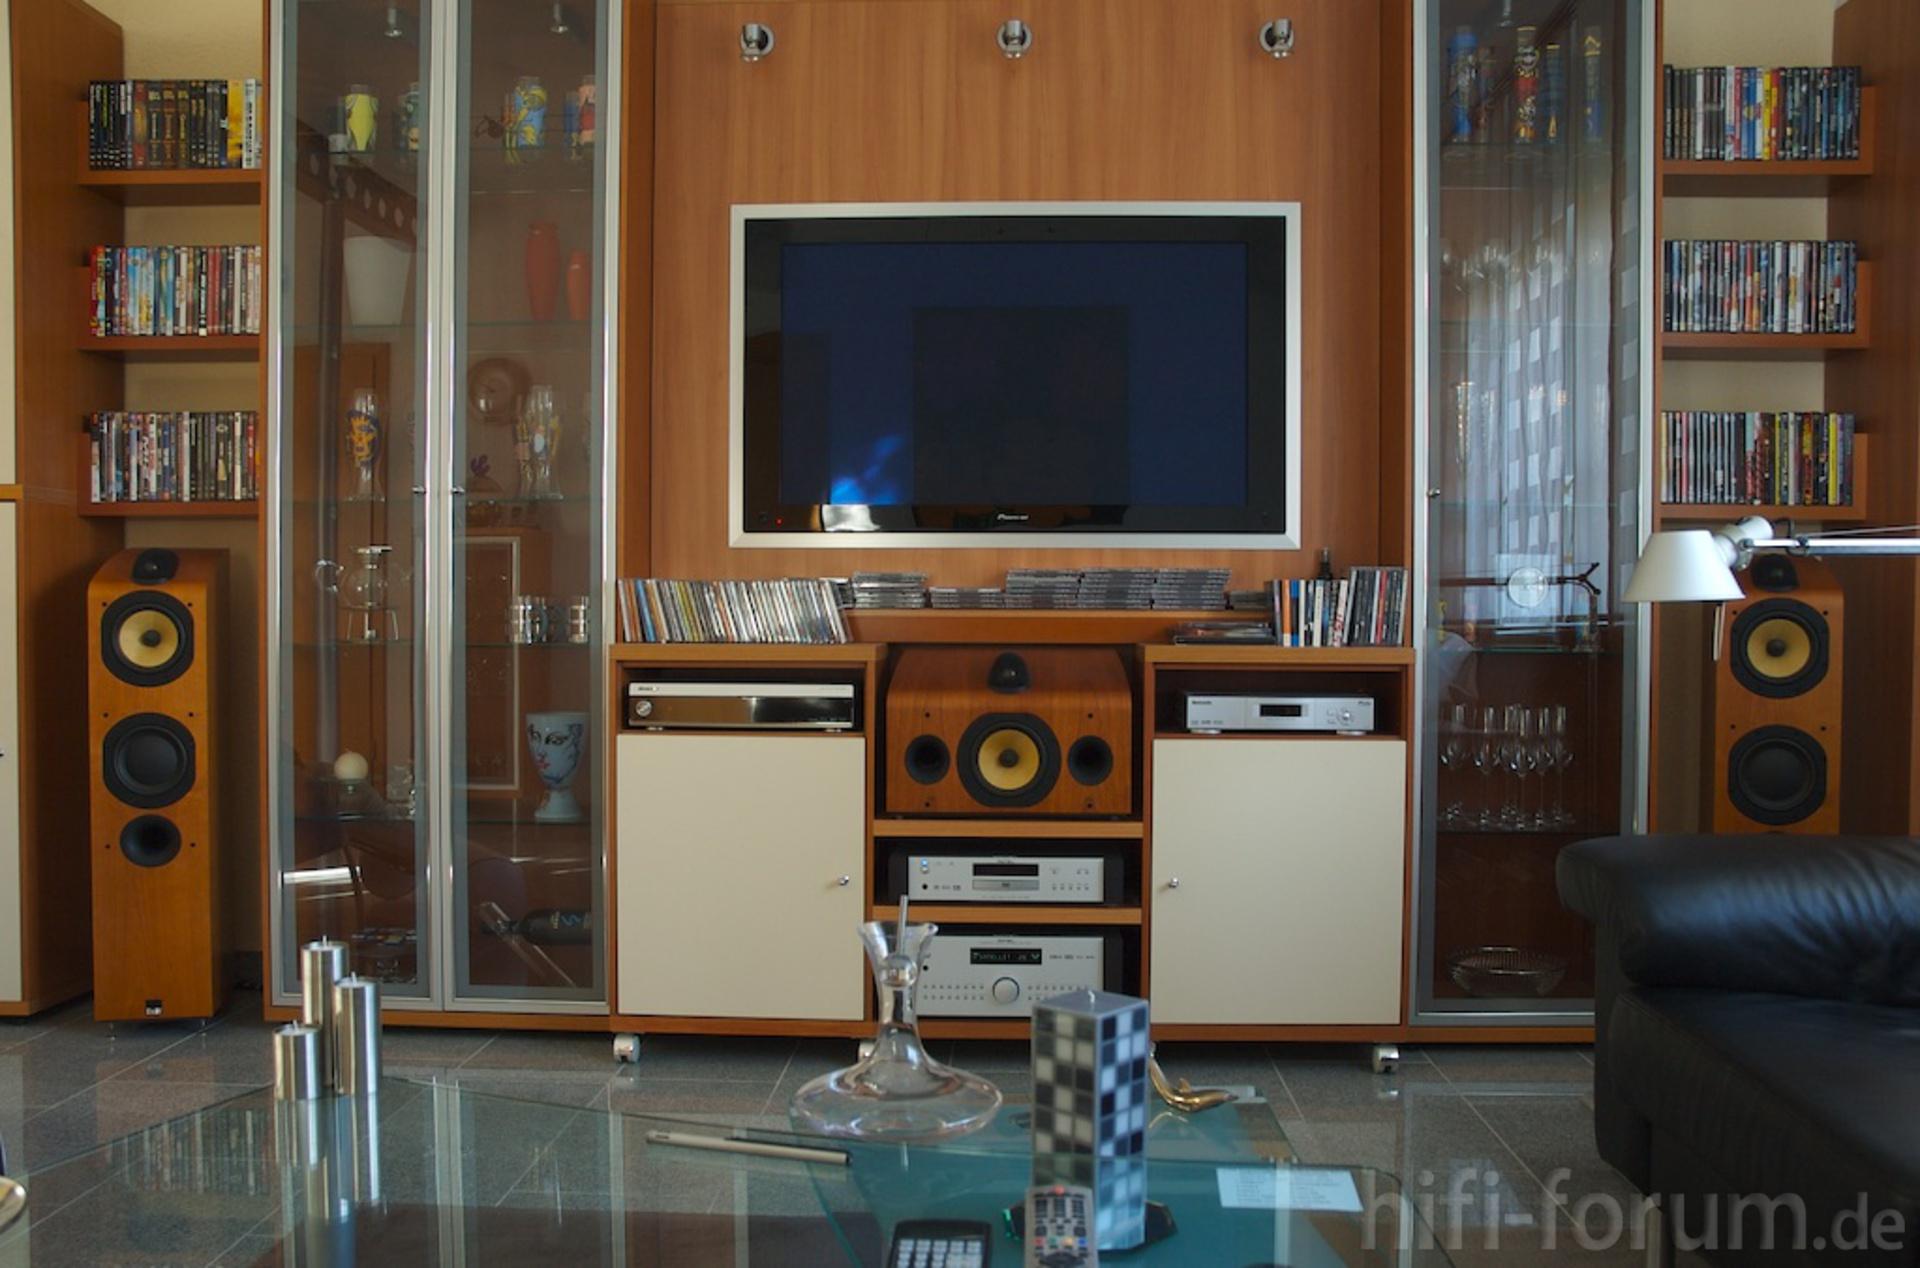 b w rotel und pioneer meets h lsta now no 2 heimkino. Black Bedroom Furniture Sets. Home Design Ideas